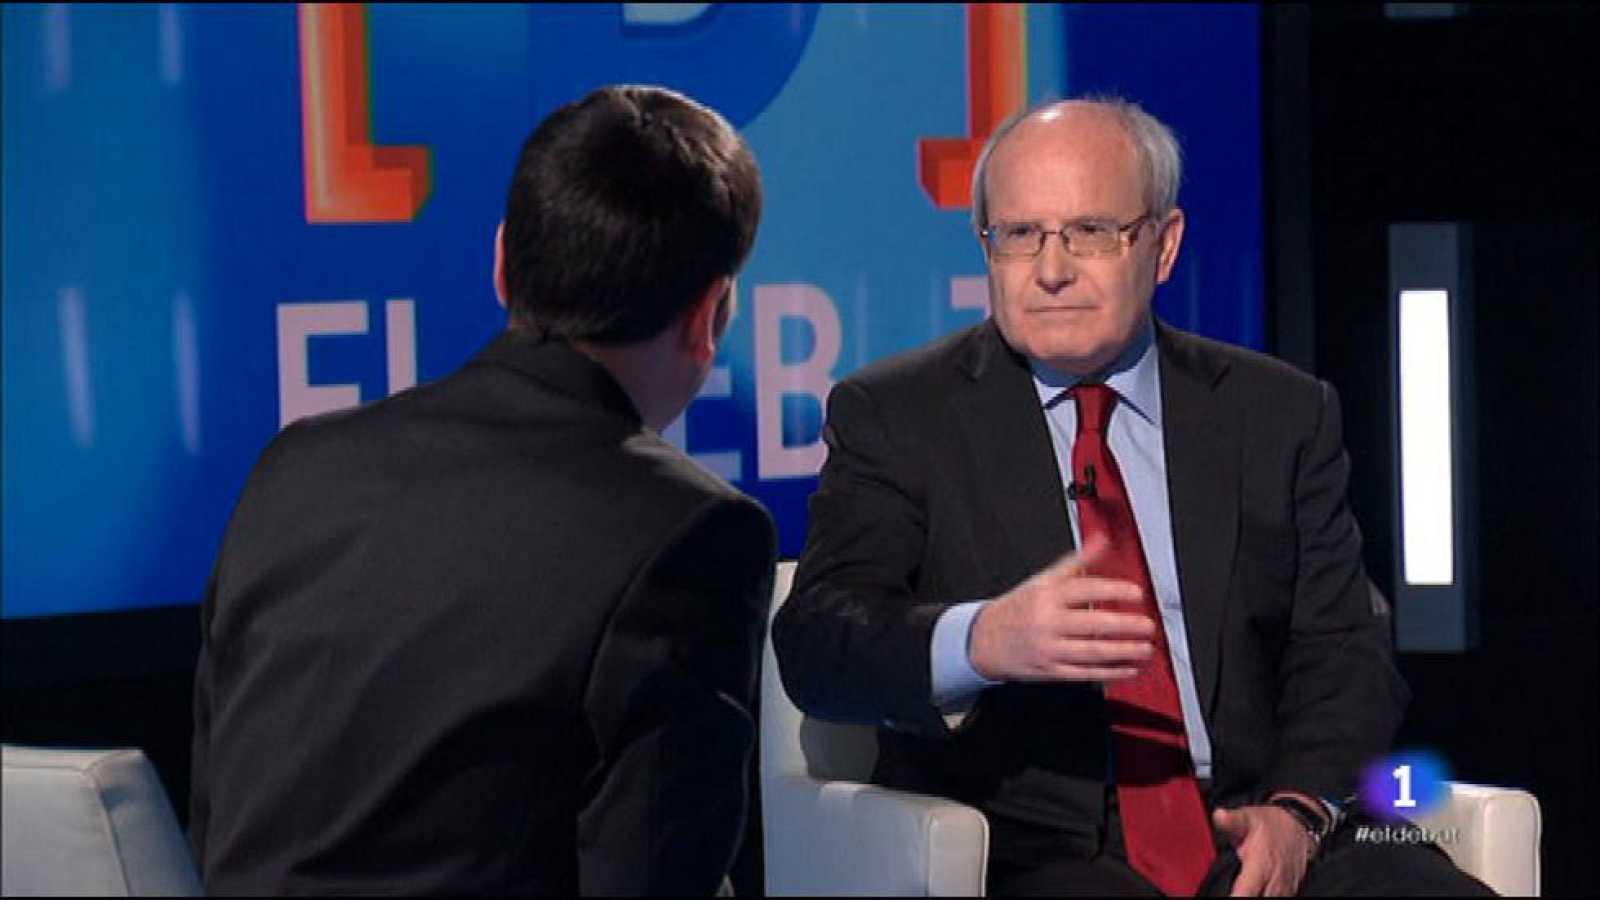 El Debat de La 1 - Entrevista a l'expresident José Montilla